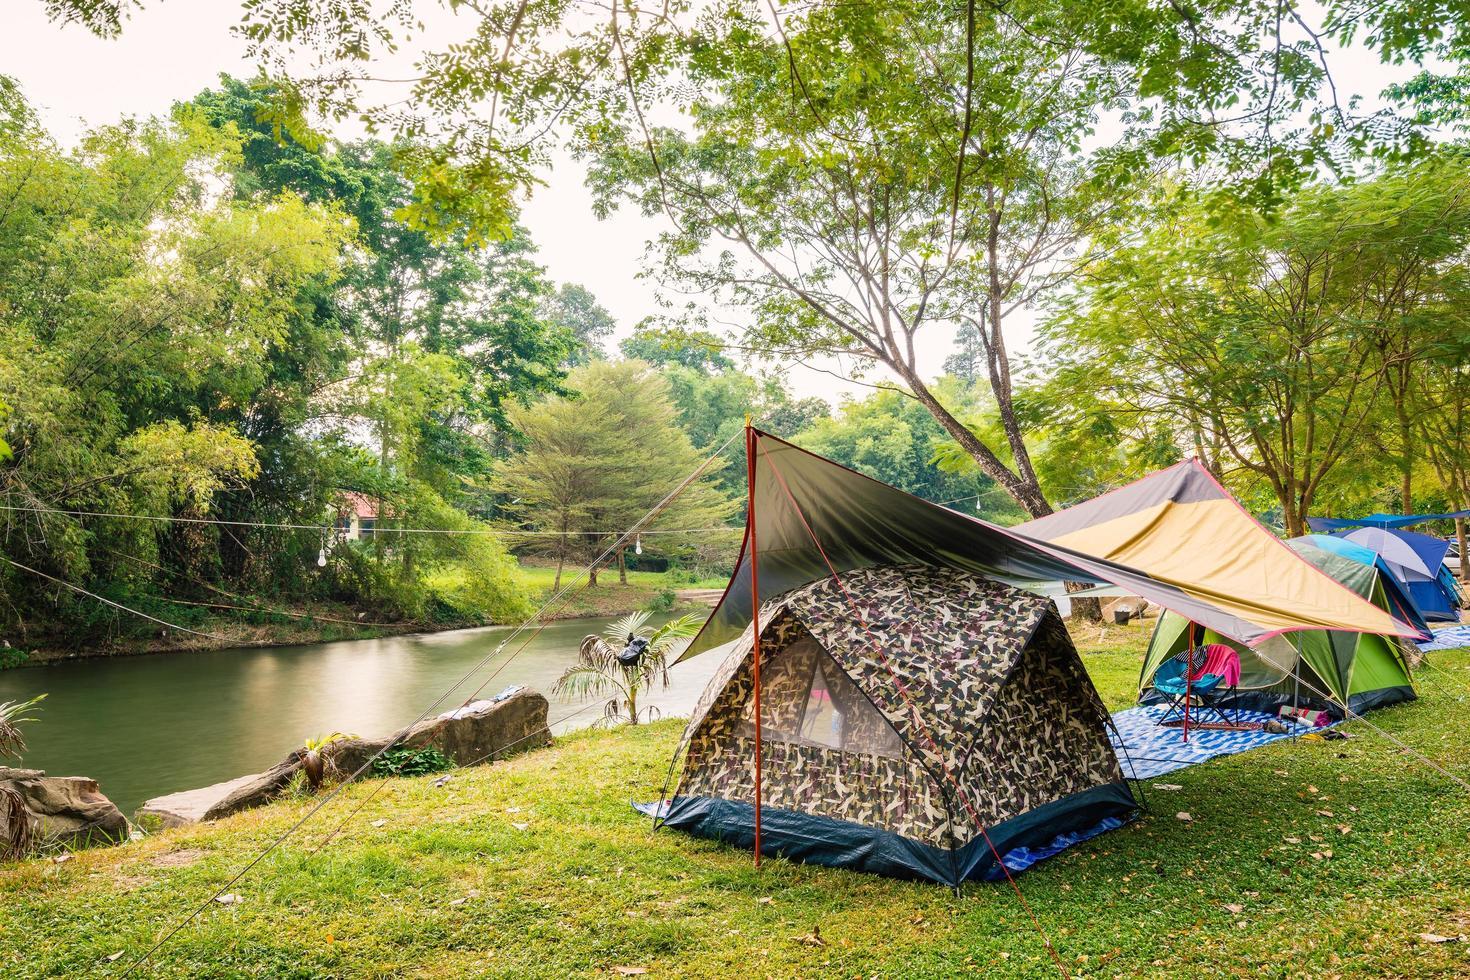 tentes de camping sur herbe photo